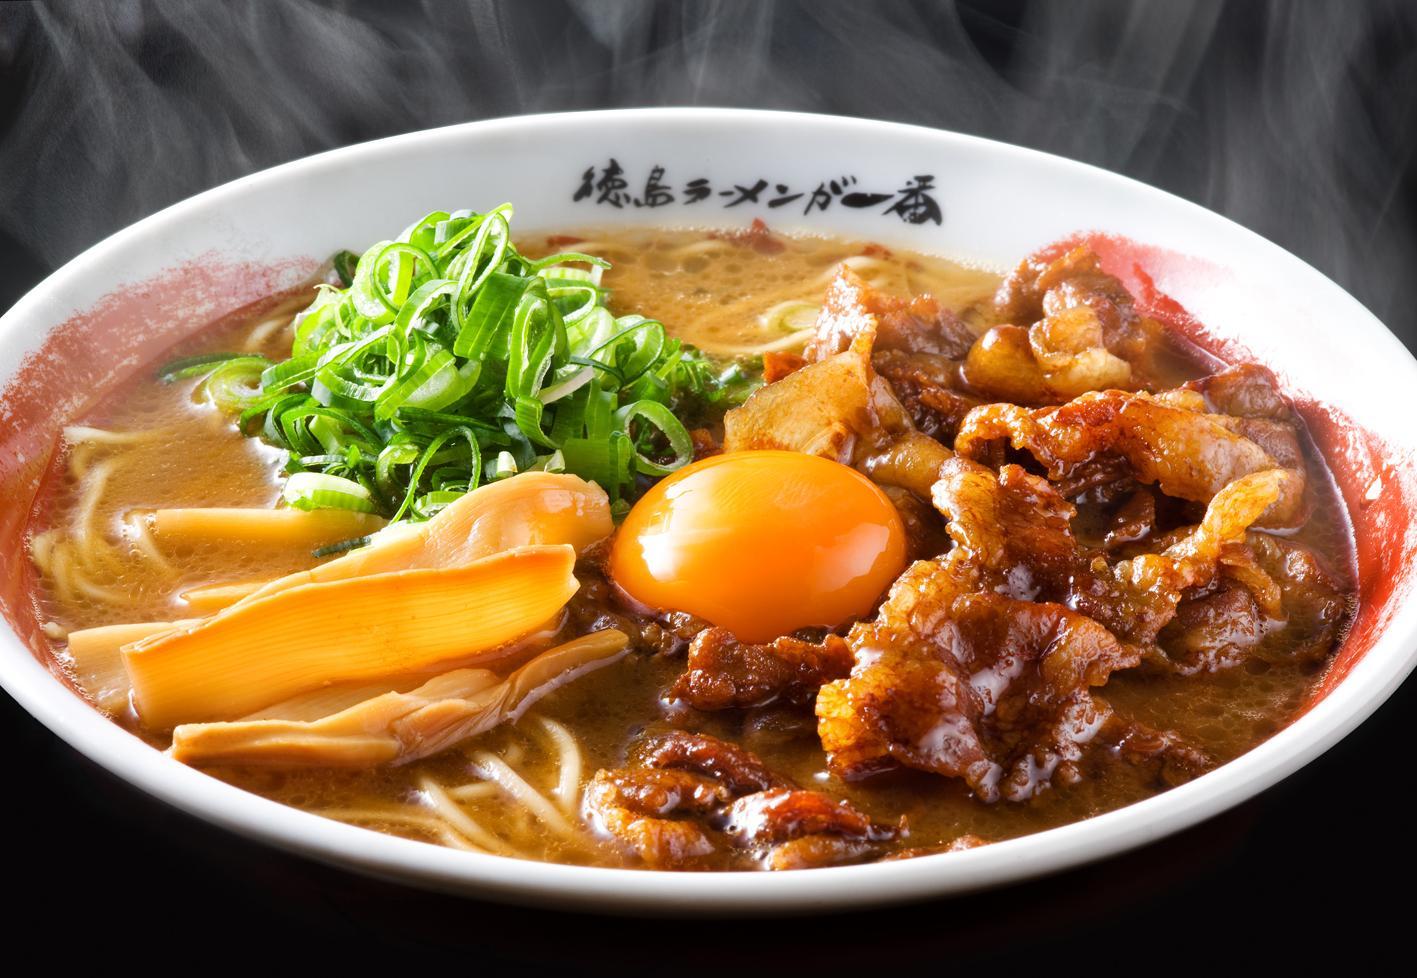 Best 4 local or prefectural ramen in Japan